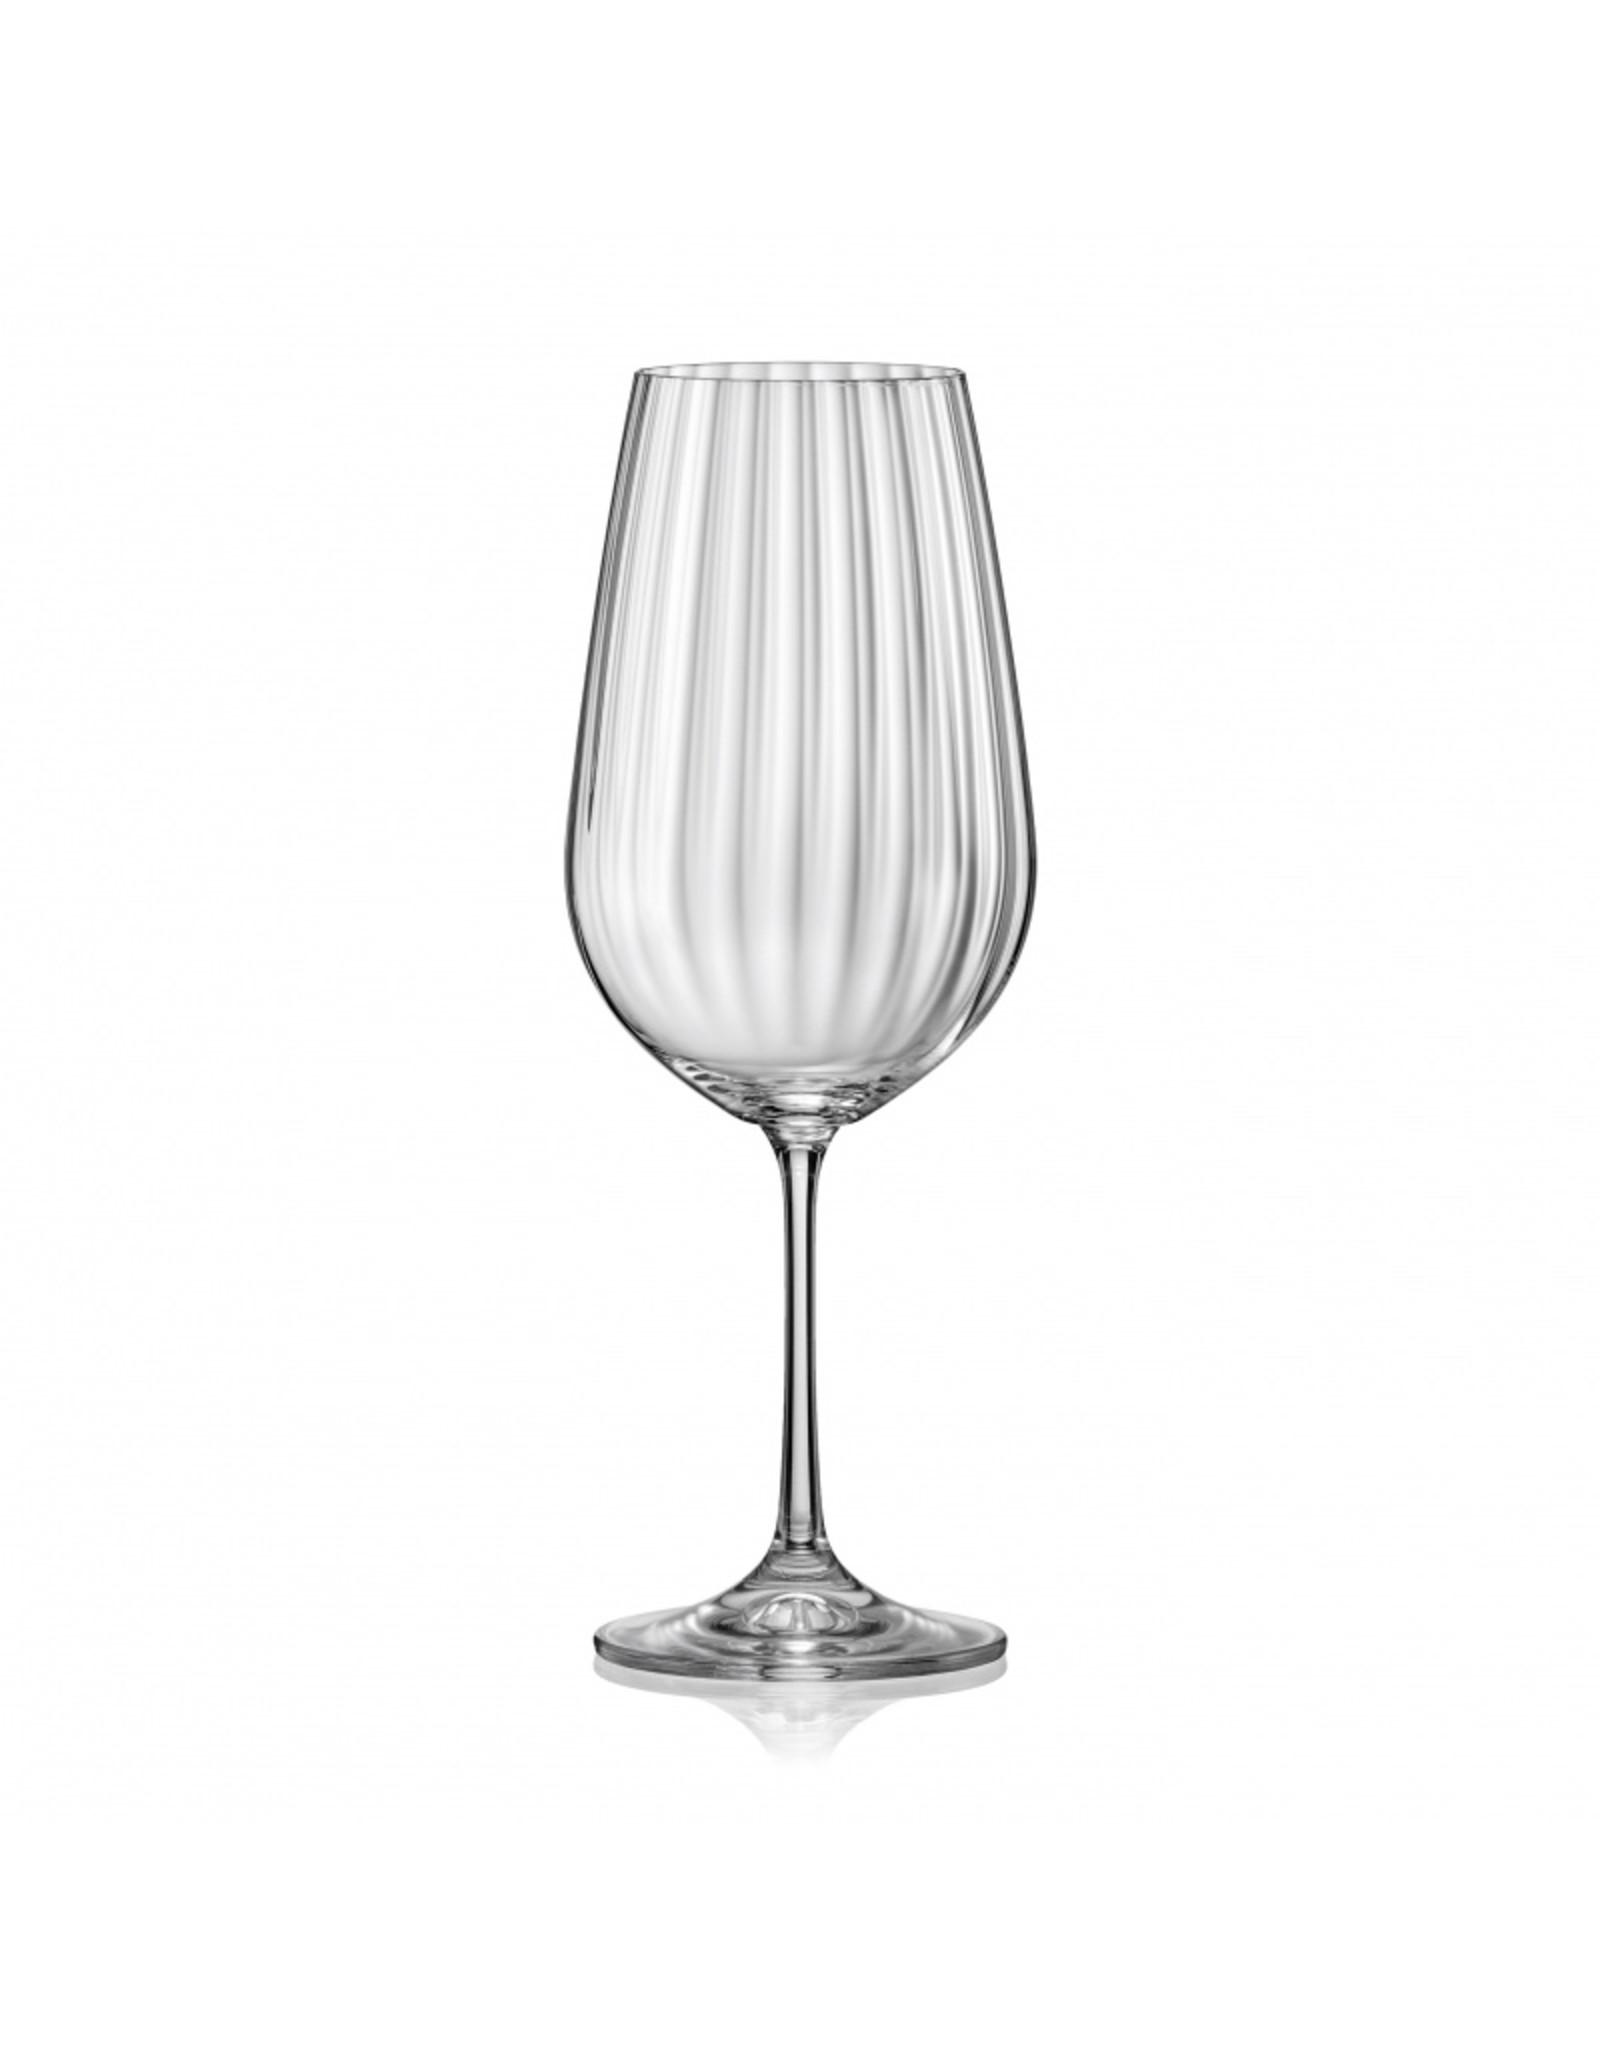 Crystalex Kristallen wijnglas Waterfall 550ml /6st